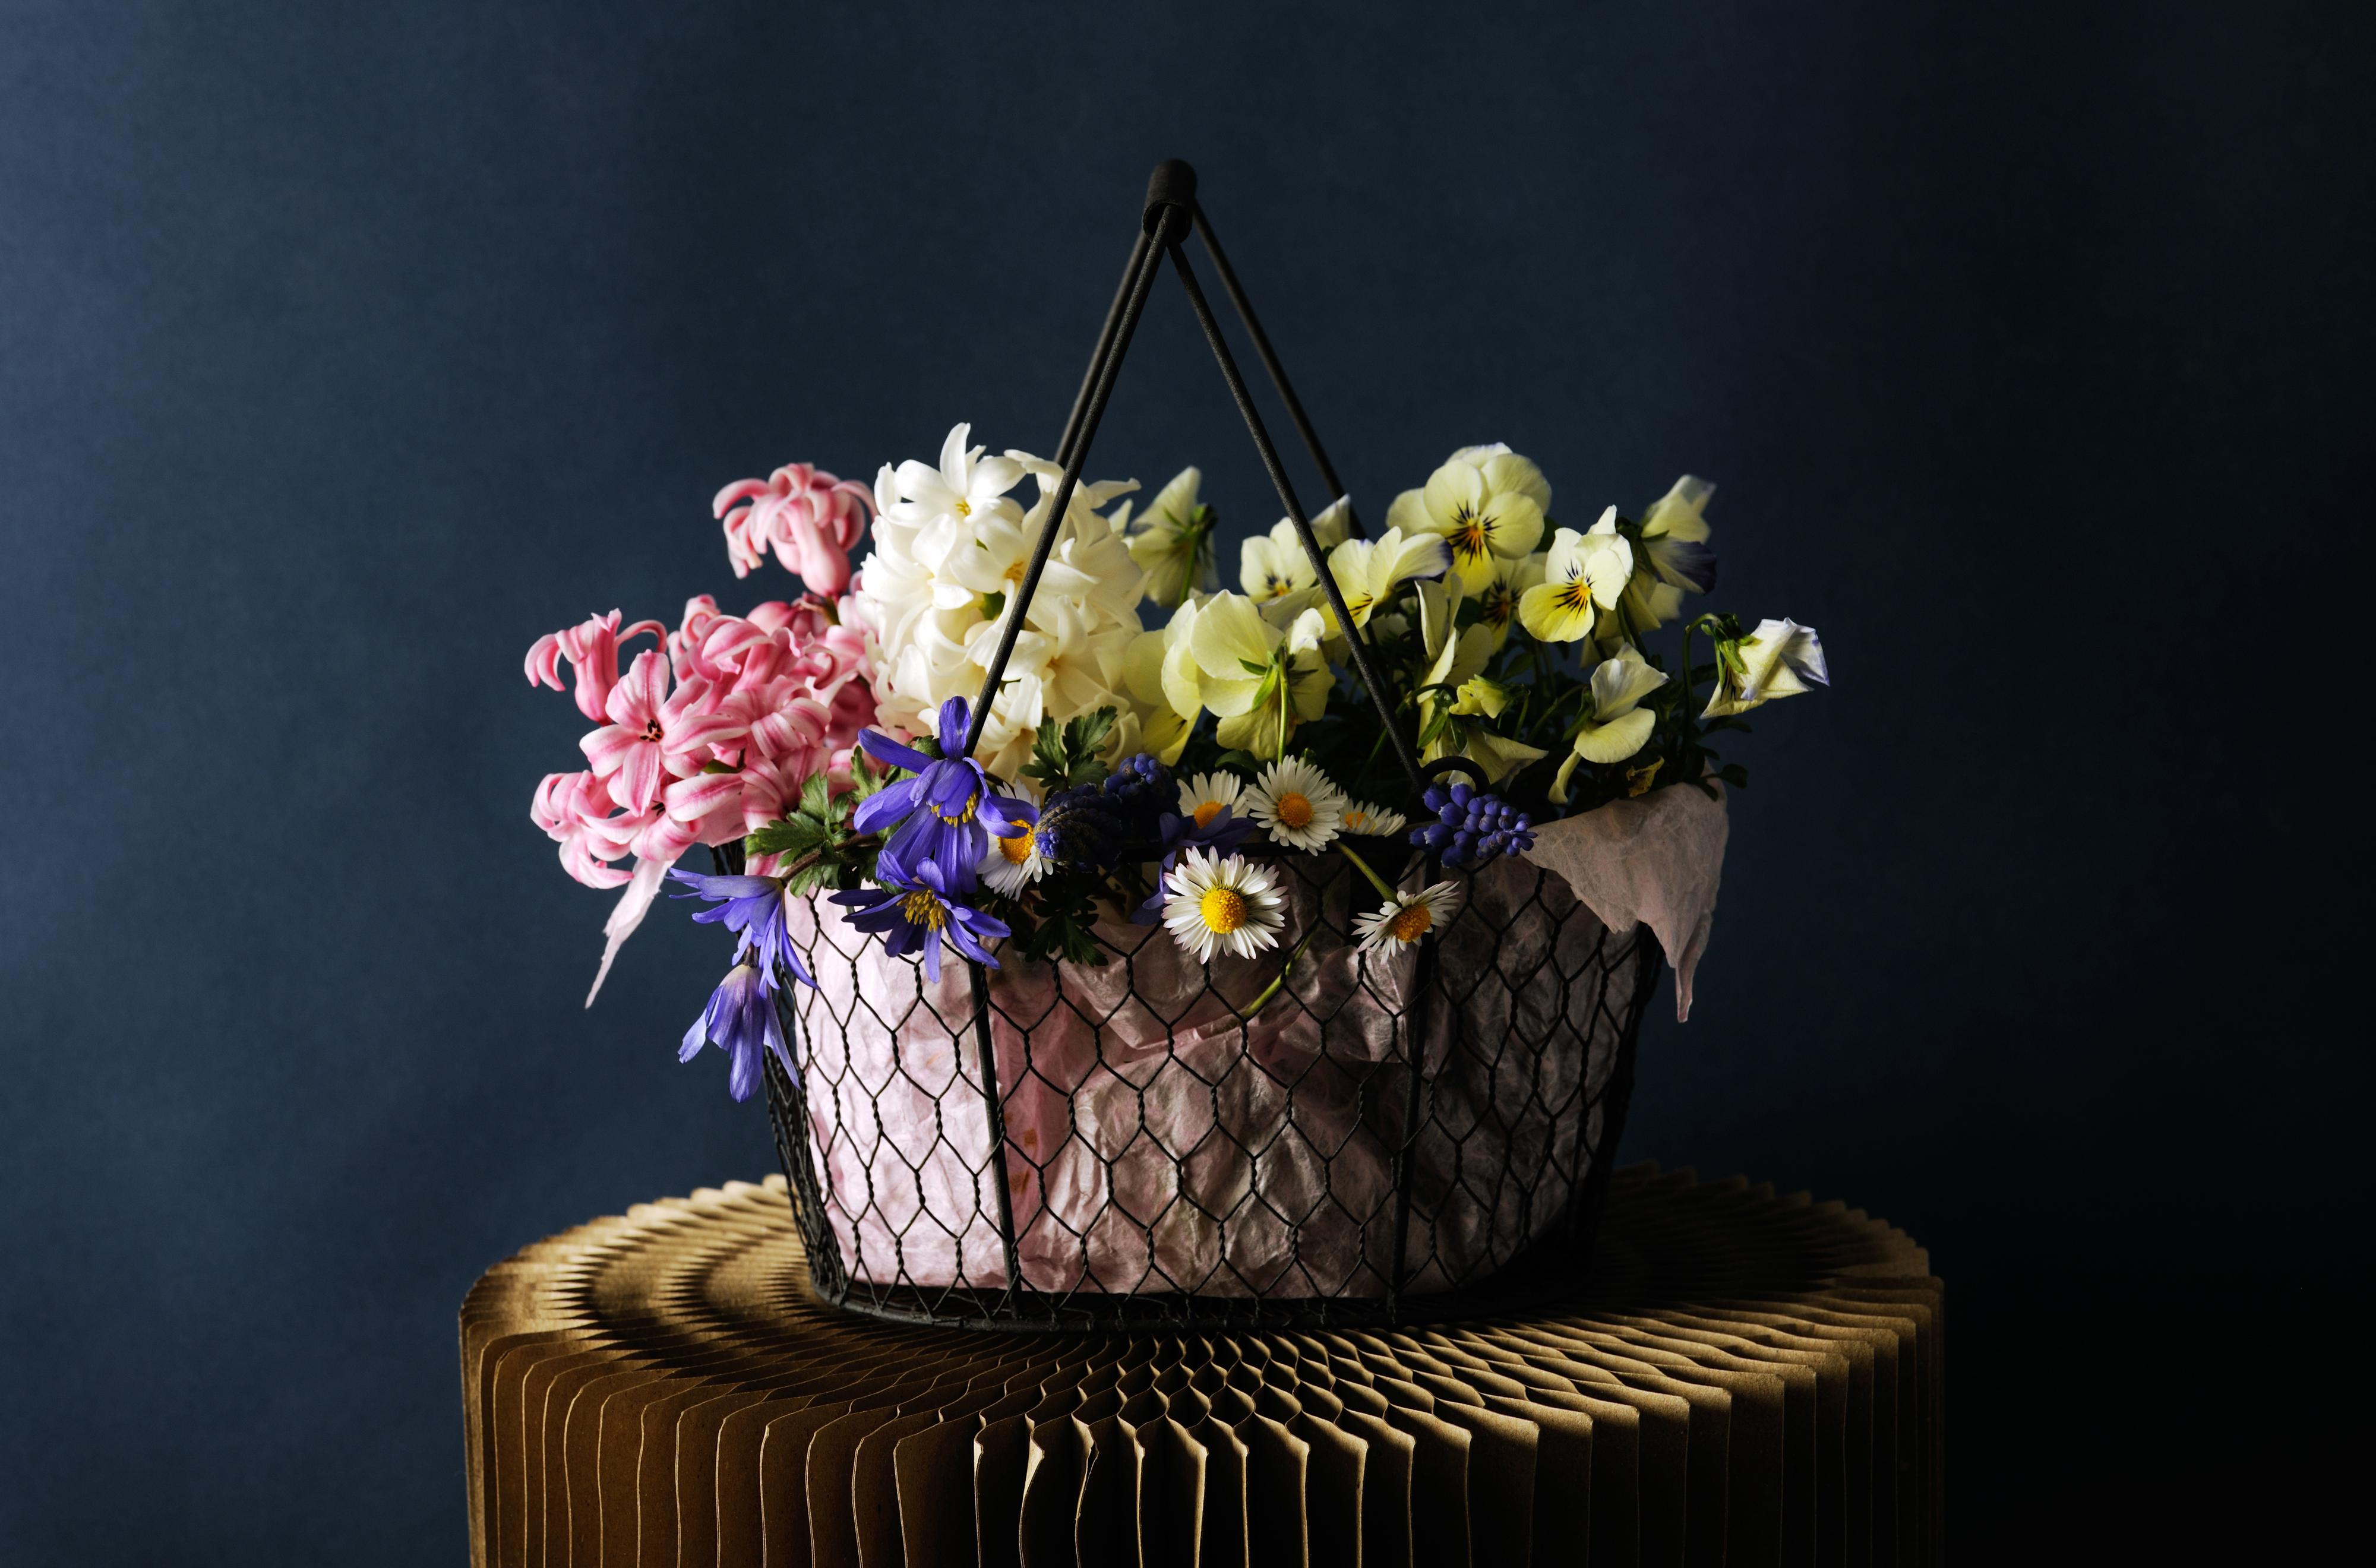 Фото Анютины глазки цветок Корзина Гиацинты 4000x2640 Фиалка трёхцветная Цветы корзины Корзинка